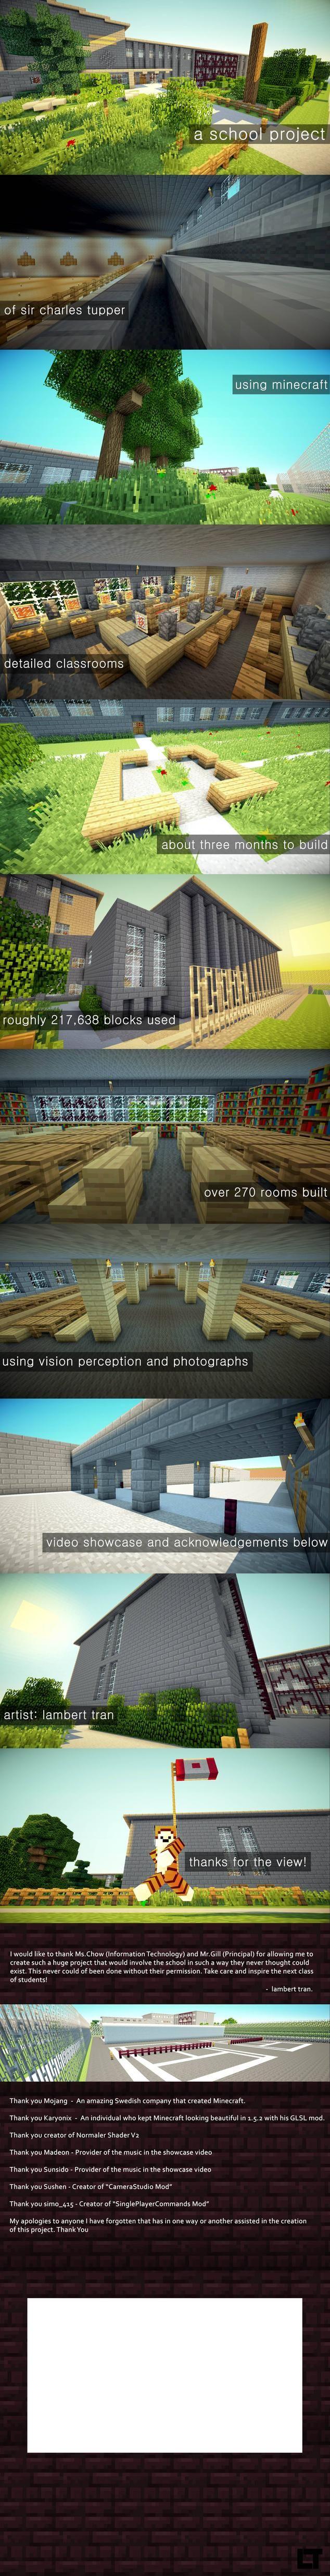 Minecraft School Project - Imgur